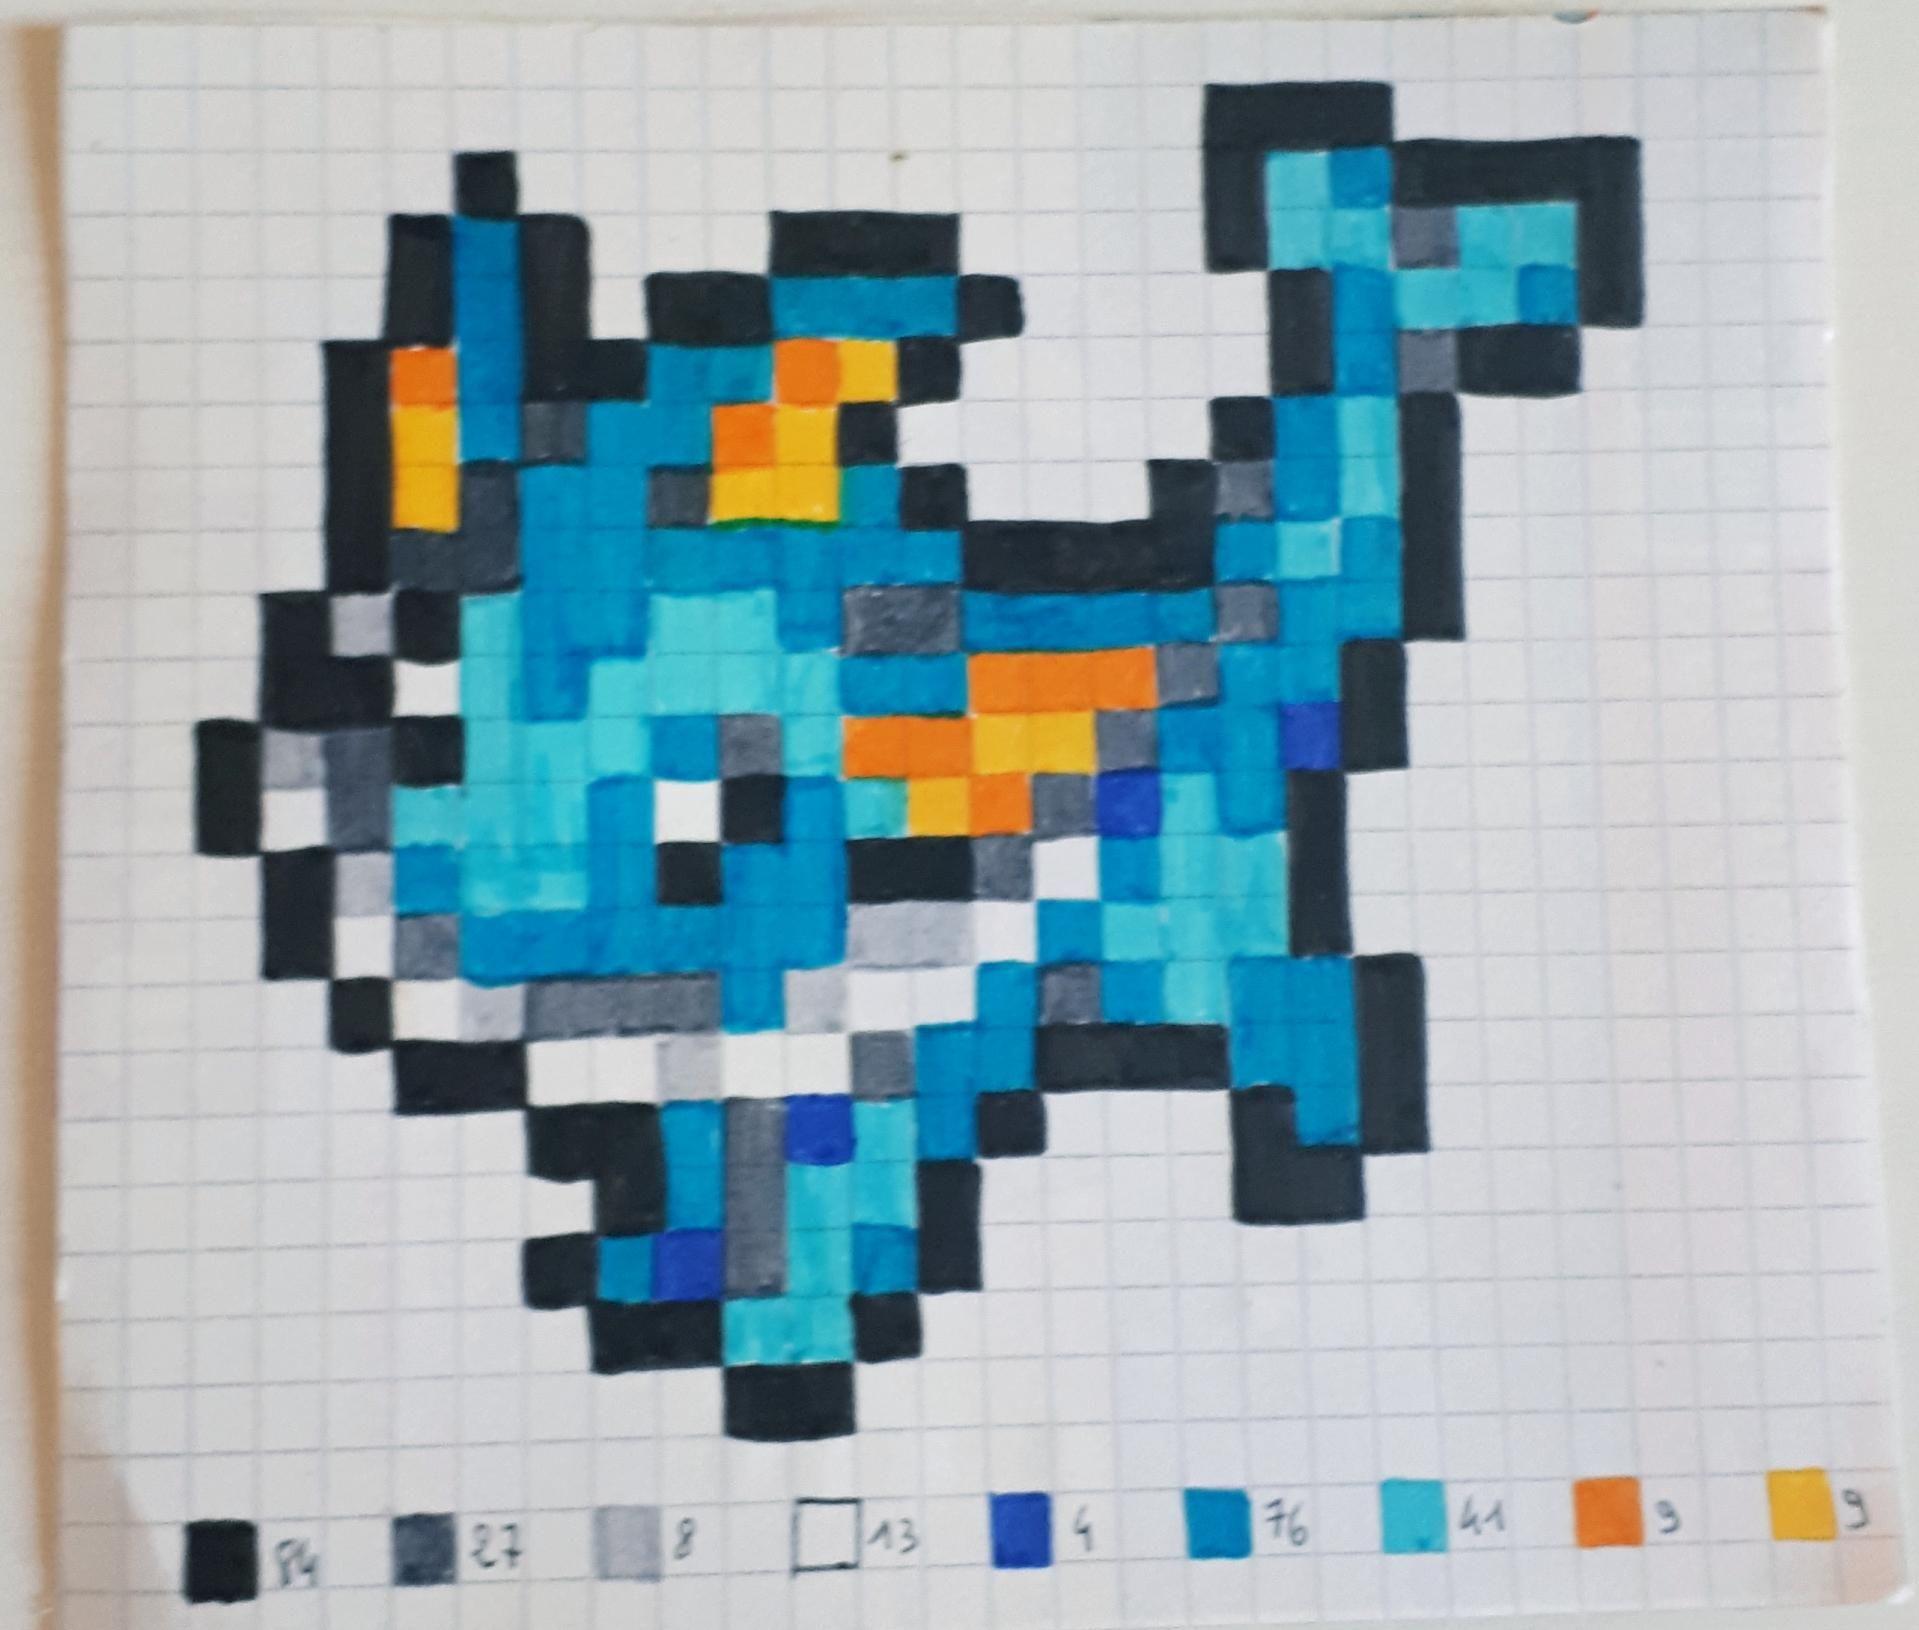 Patron Pixel Pokemon Aquali Hama Pokemon Perle Pixel